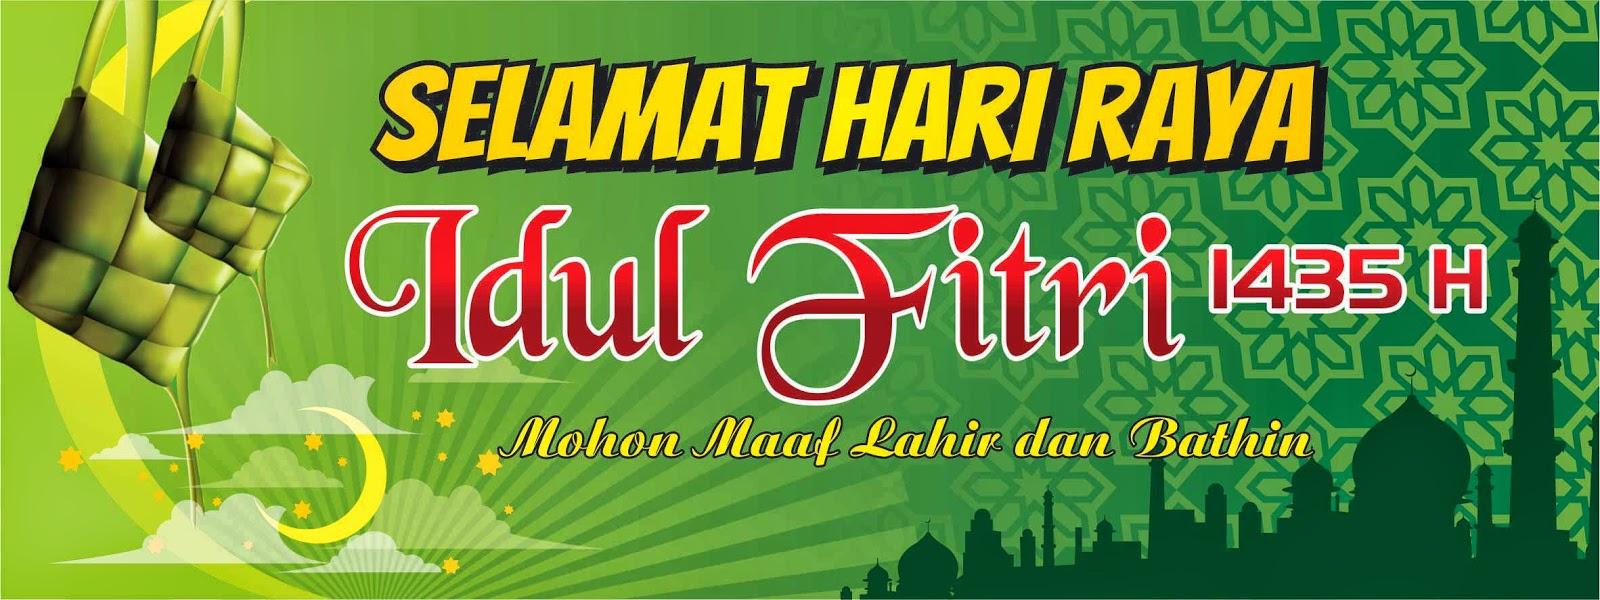 Bonus Desain Idul Fitri! hehe, penak toh dapet 2